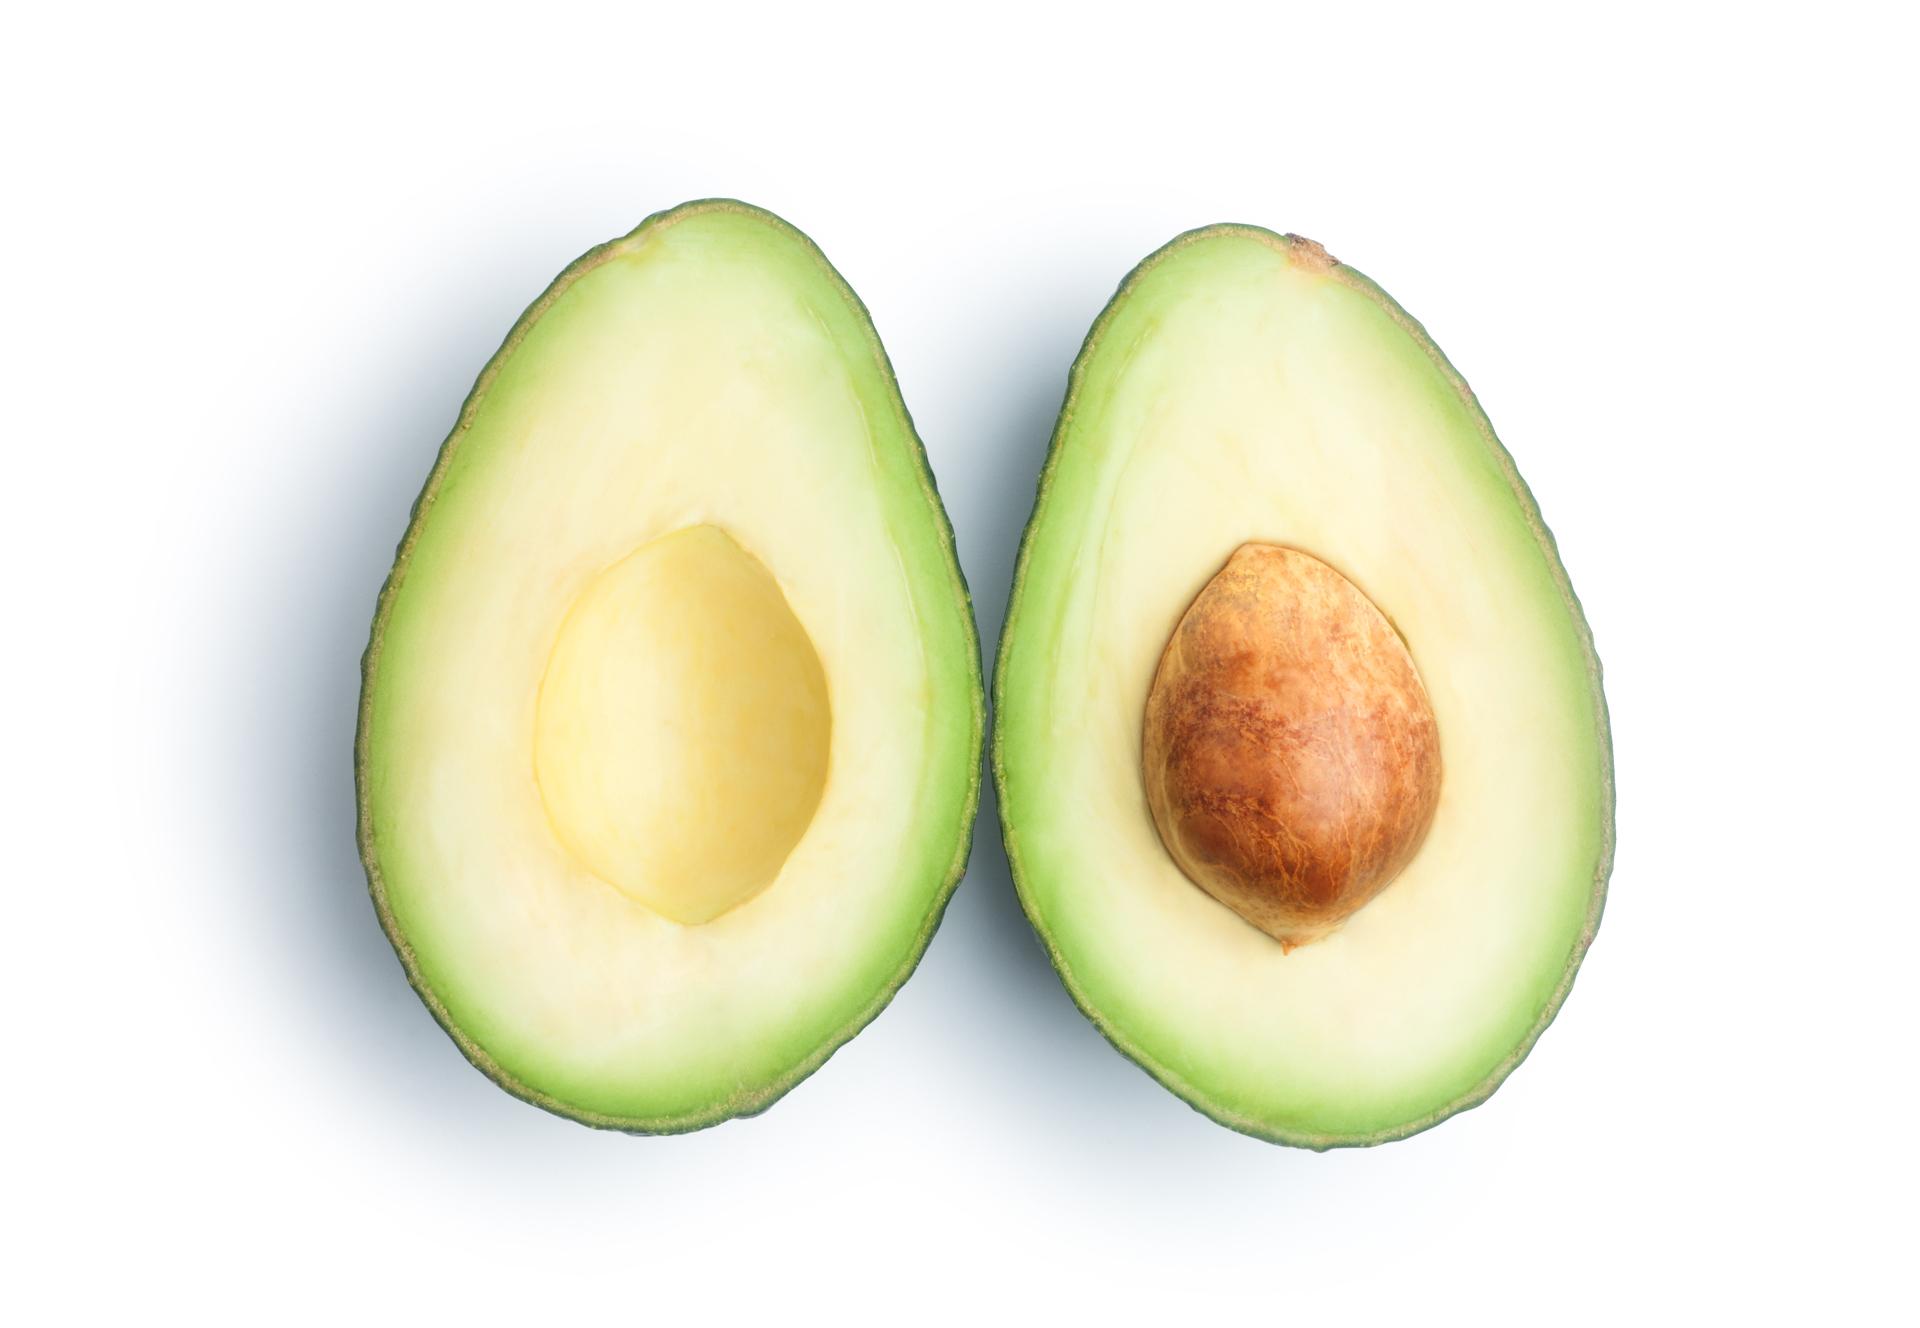 a photo of a ripe avocado split in half